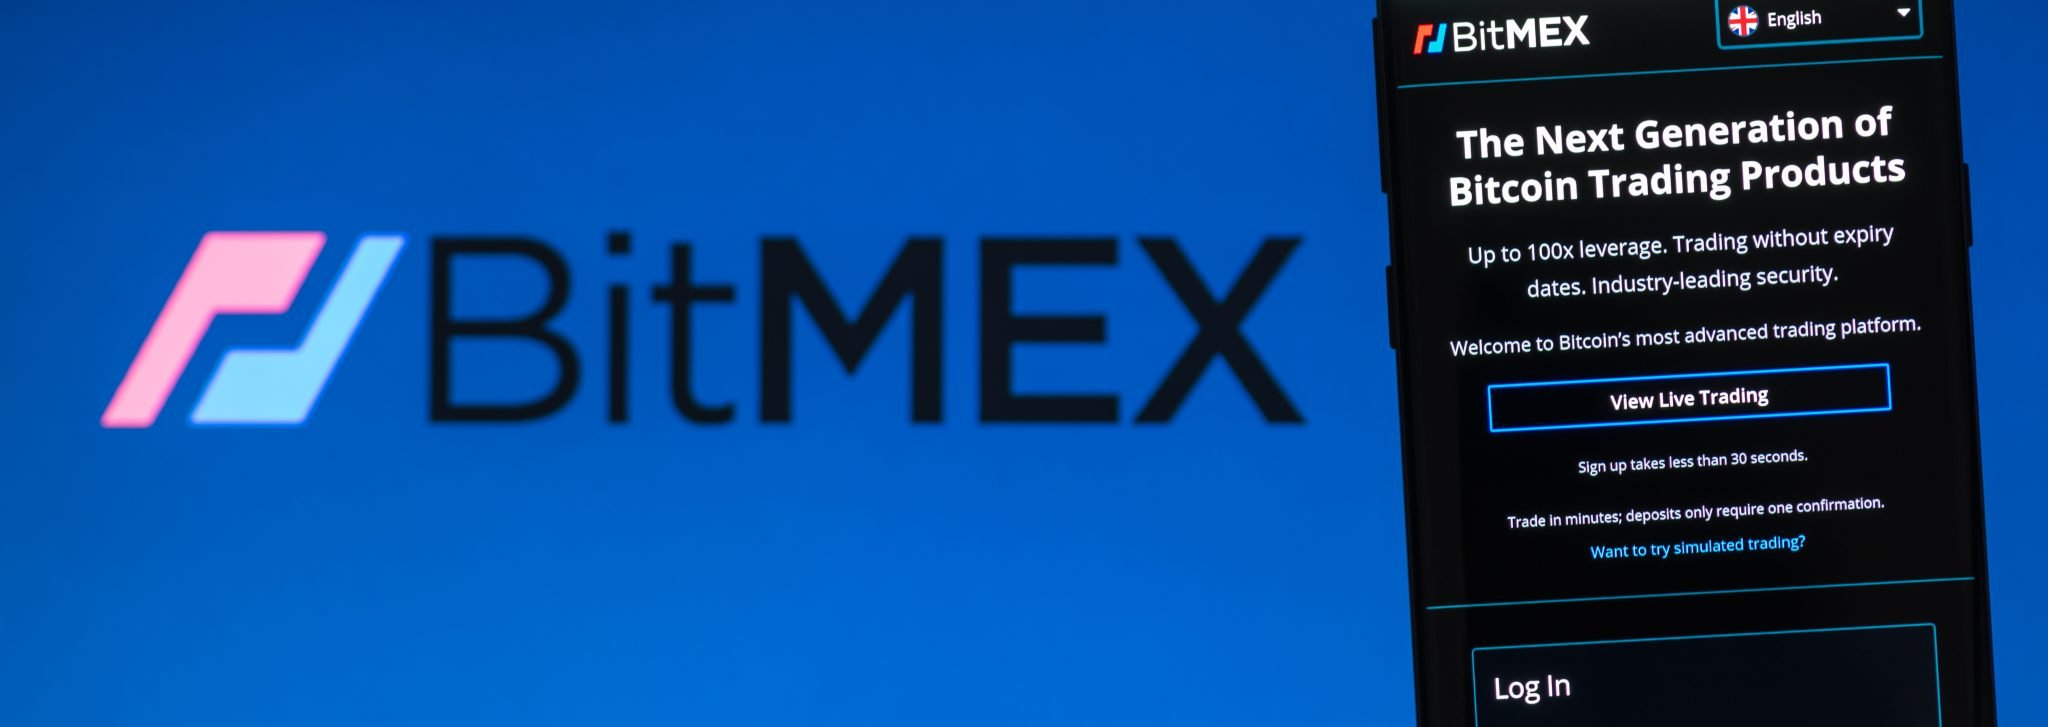 KIEV, UKRAINE - APRIL 2, 2020: BitMEX website displayed on the smartphone screen. BitMEX is a cryptocurrency exchange and derivative trading platform.